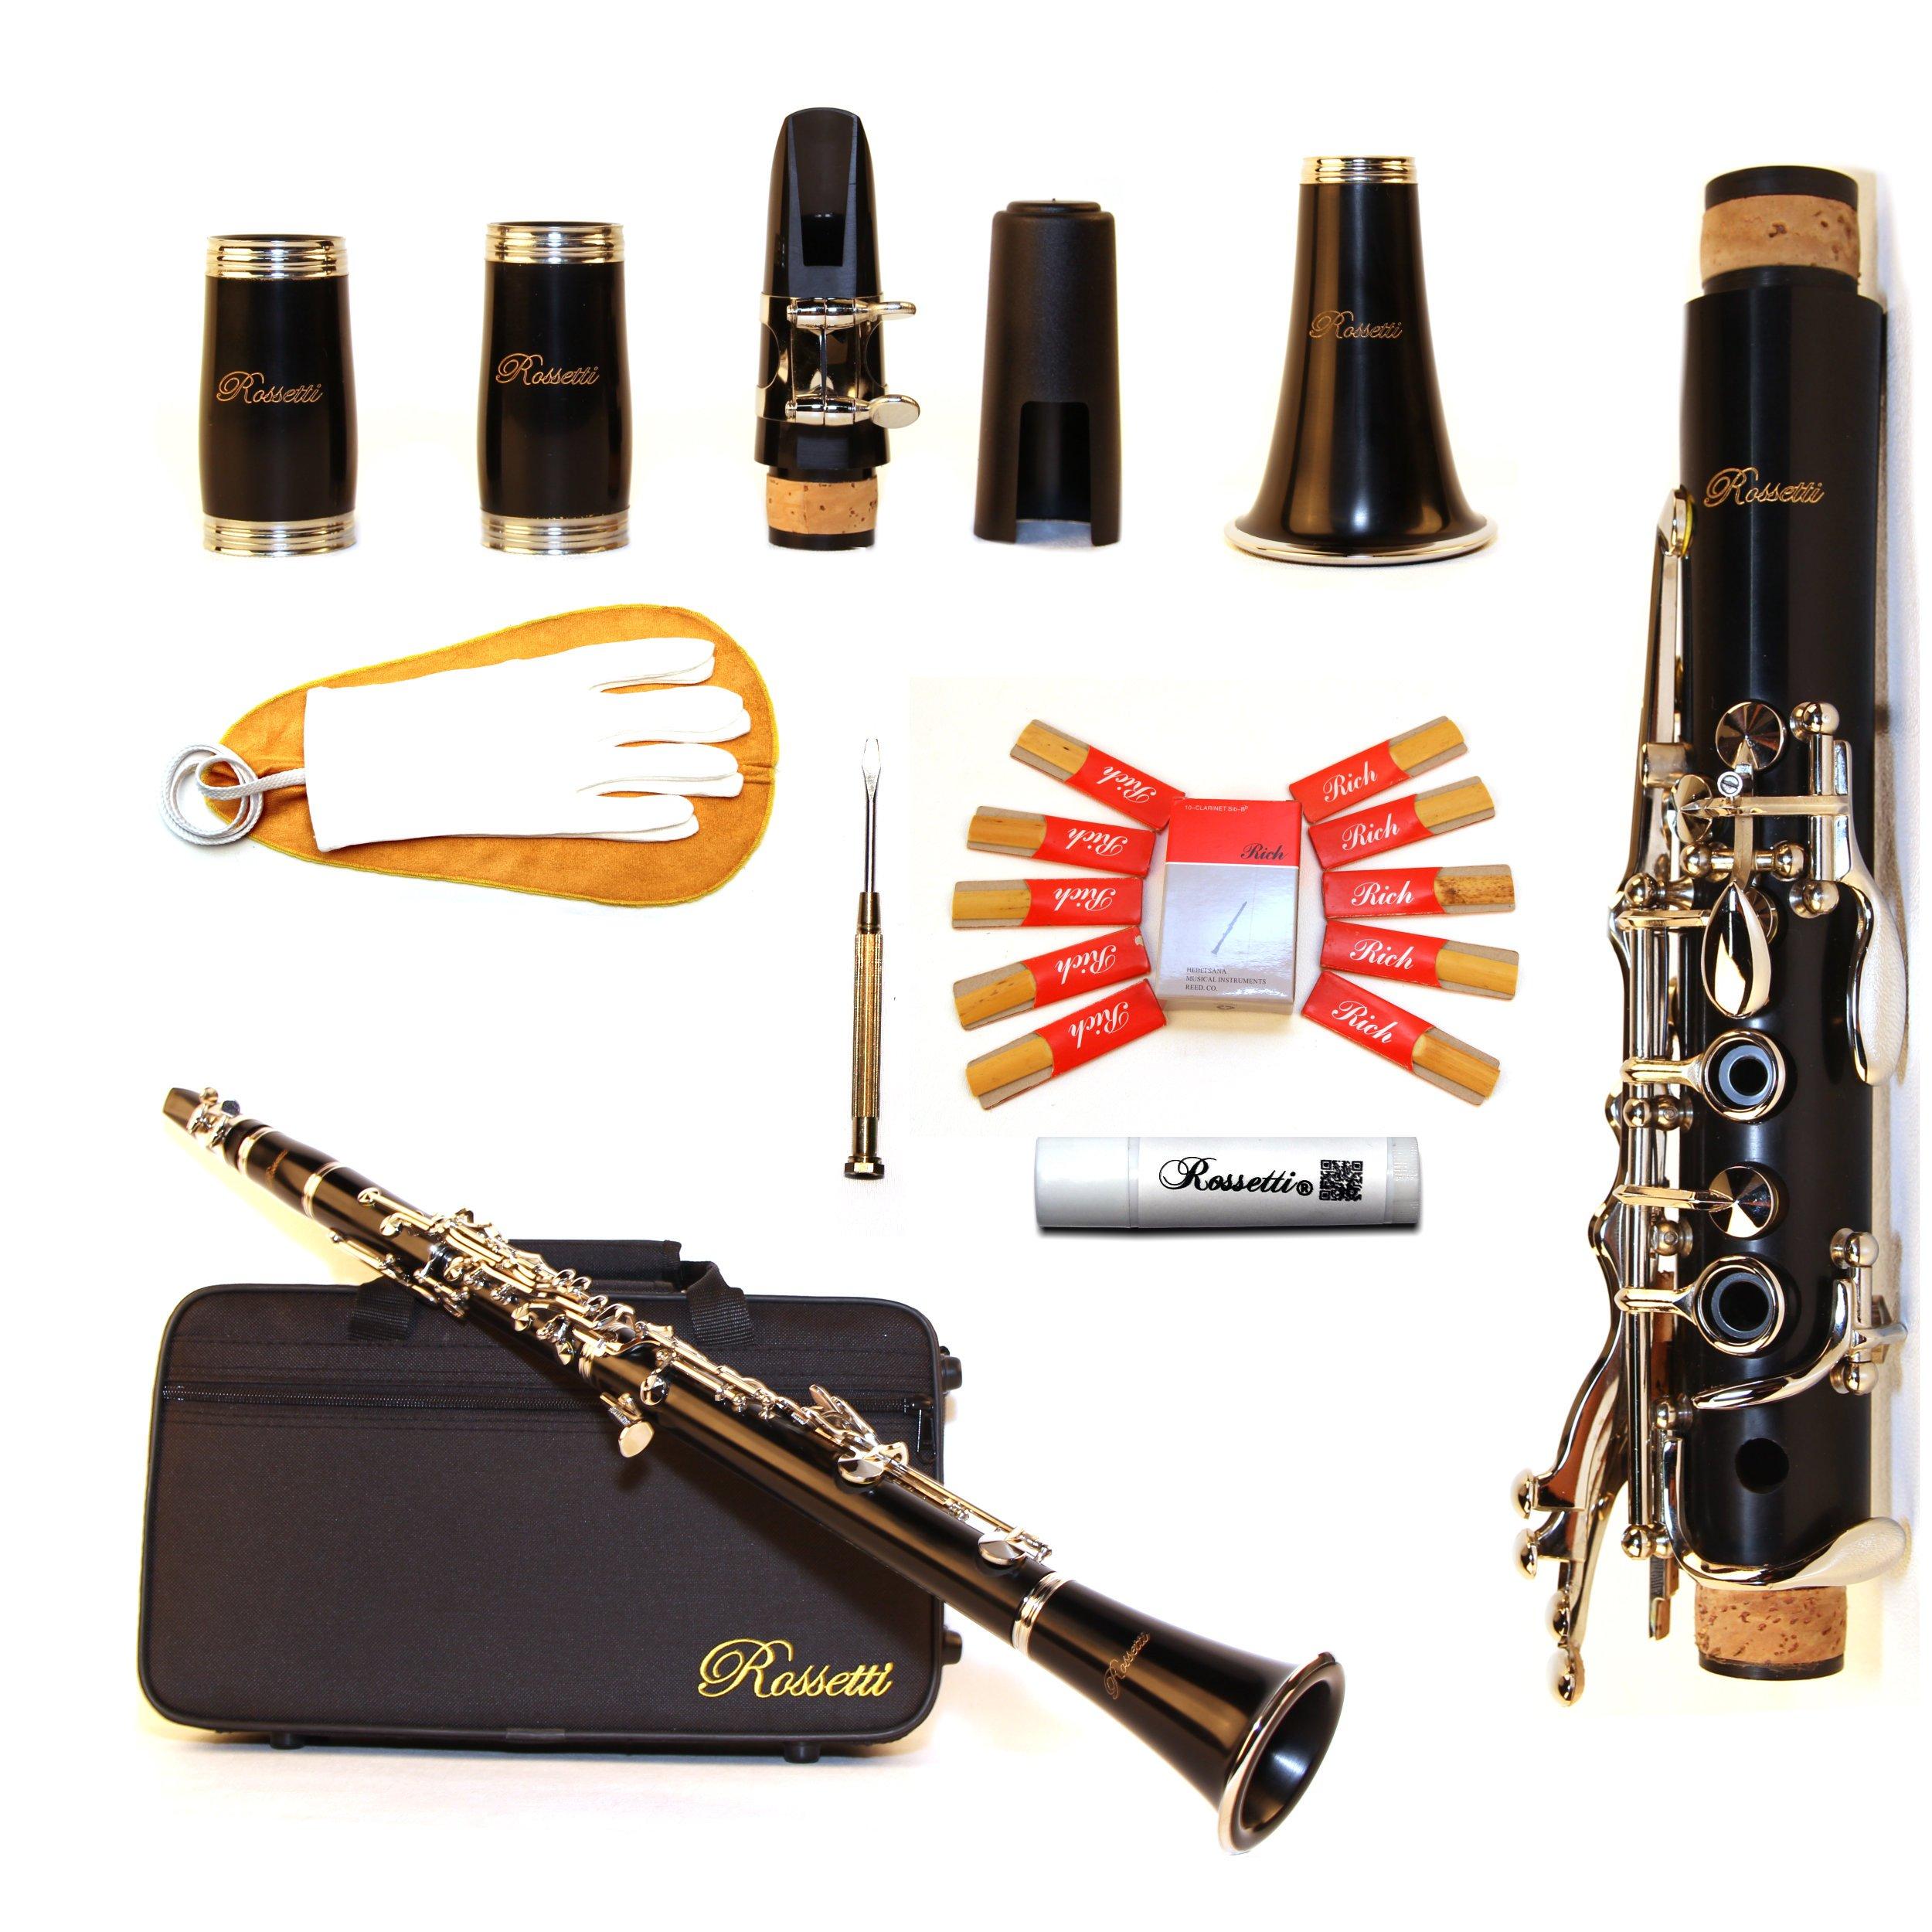 Rossetti Intermediate Soprano Bb Clarinet Black, ROS1149